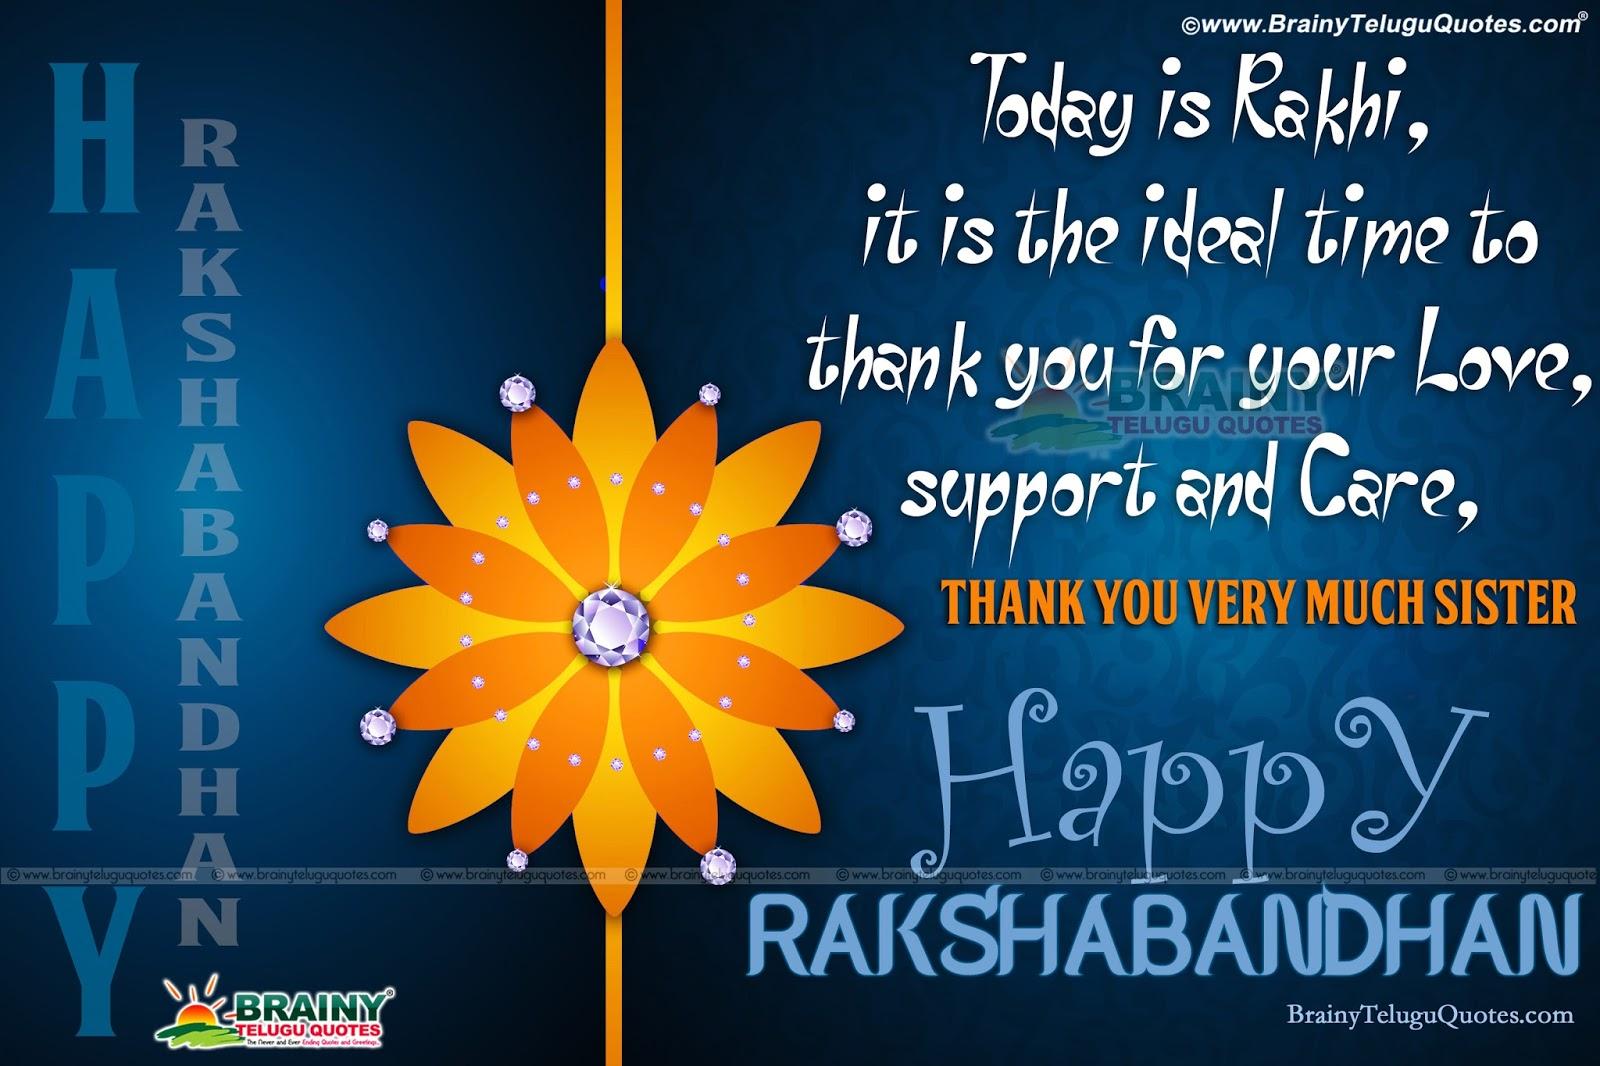 Happy Raksha Bandhan Sister Quotes And Wishes In English